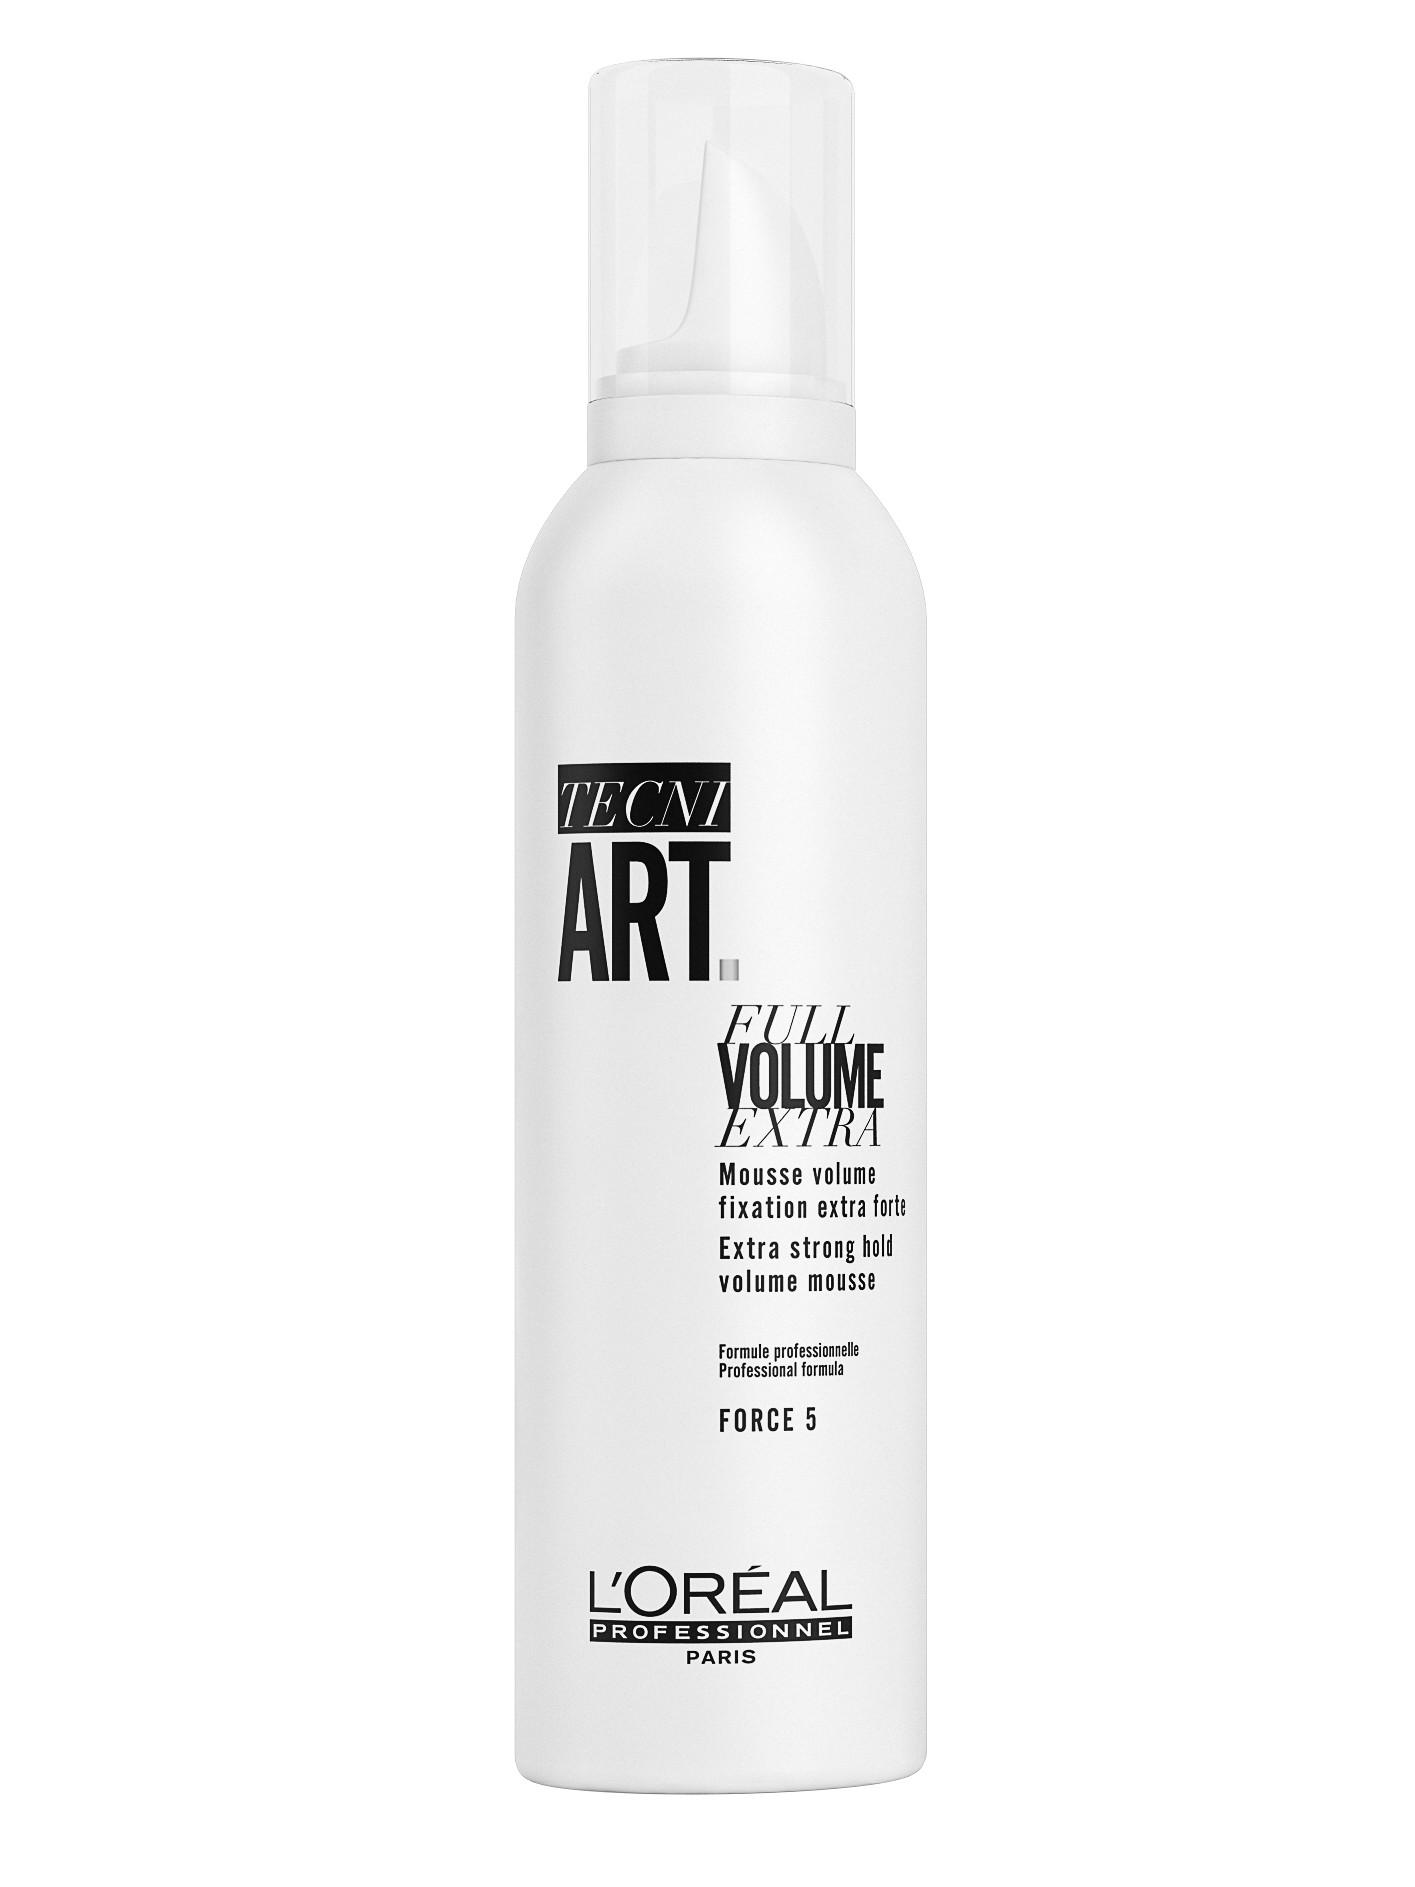 Pěna pro extra objem Loréal Tecni.Art Full Volume Extra - 250 ml - L'Oréal Professionnel + DÁREK ZDARMA